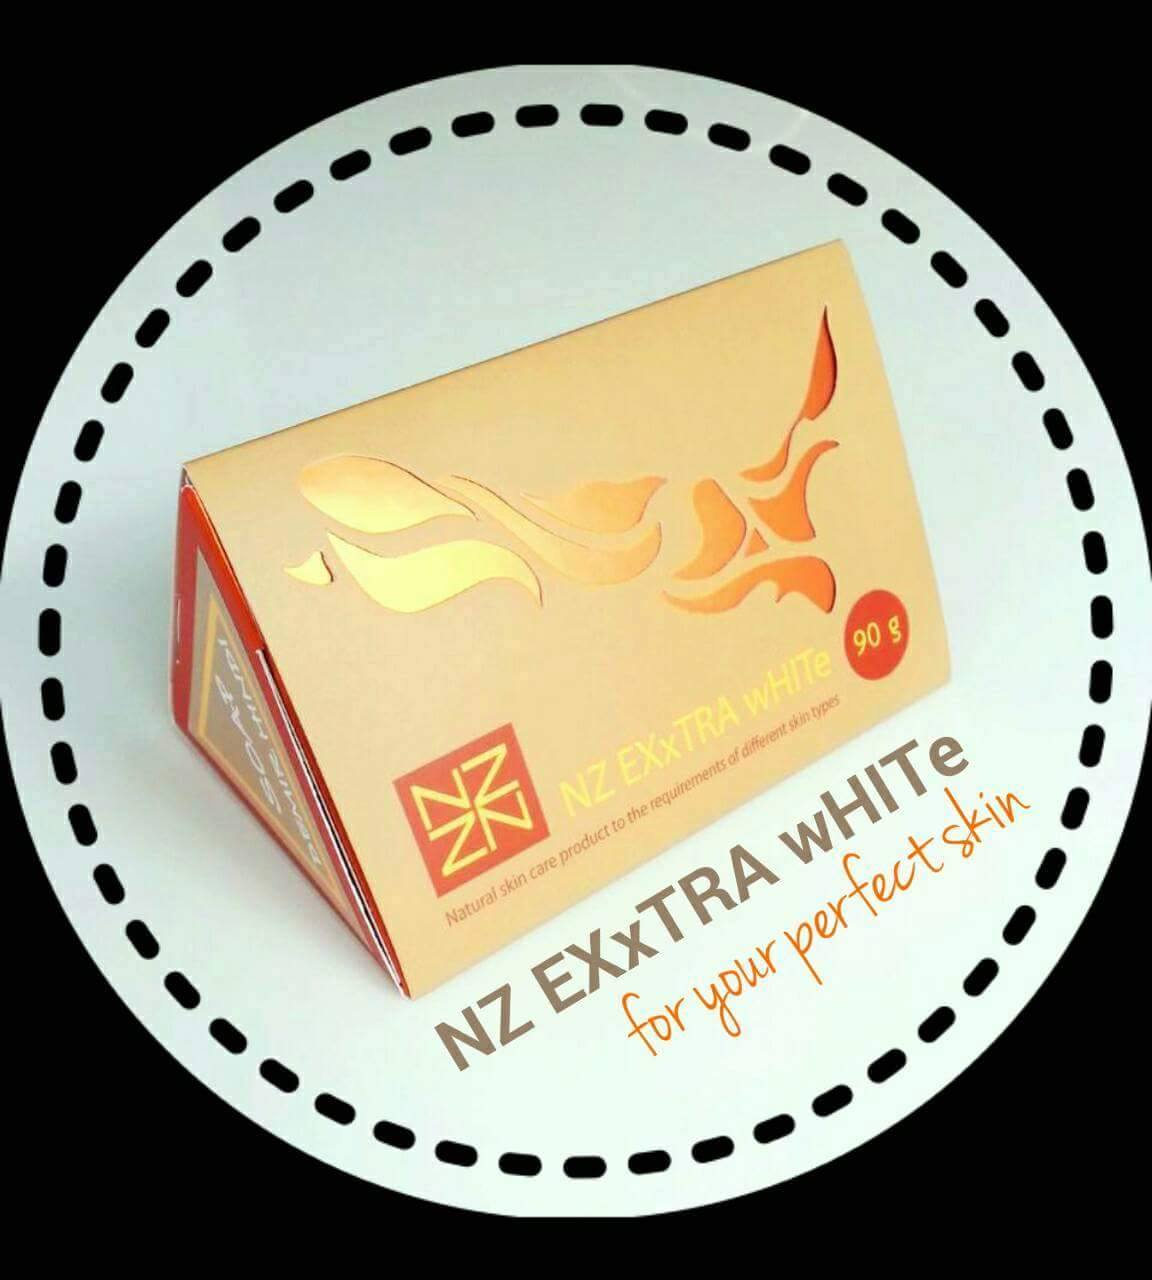 "NZ EXxTRA wHITe SOAP ""สูตรออร่านางฟ้า"" สูตร ขาวไว ที่สุด"